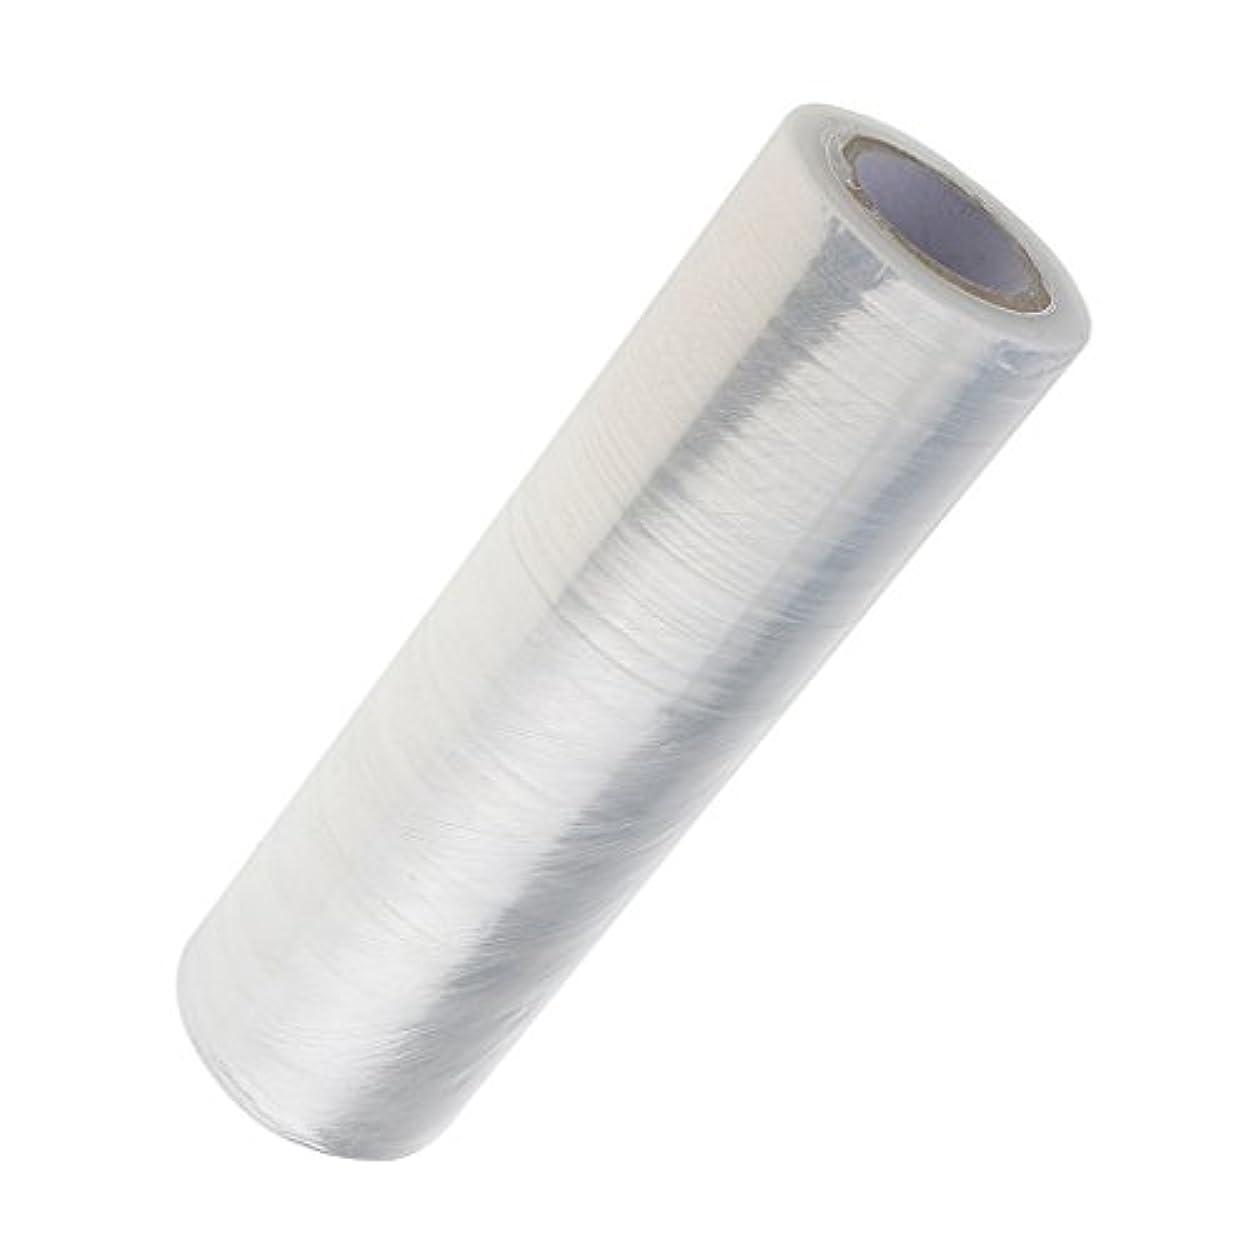 Perfk 1ロール 美容用ラップ プラスチック 髪用ラップ ボディラップ ペーパー ウエスト/足 家庭サロン適用 燃焼汗 ヘアケア